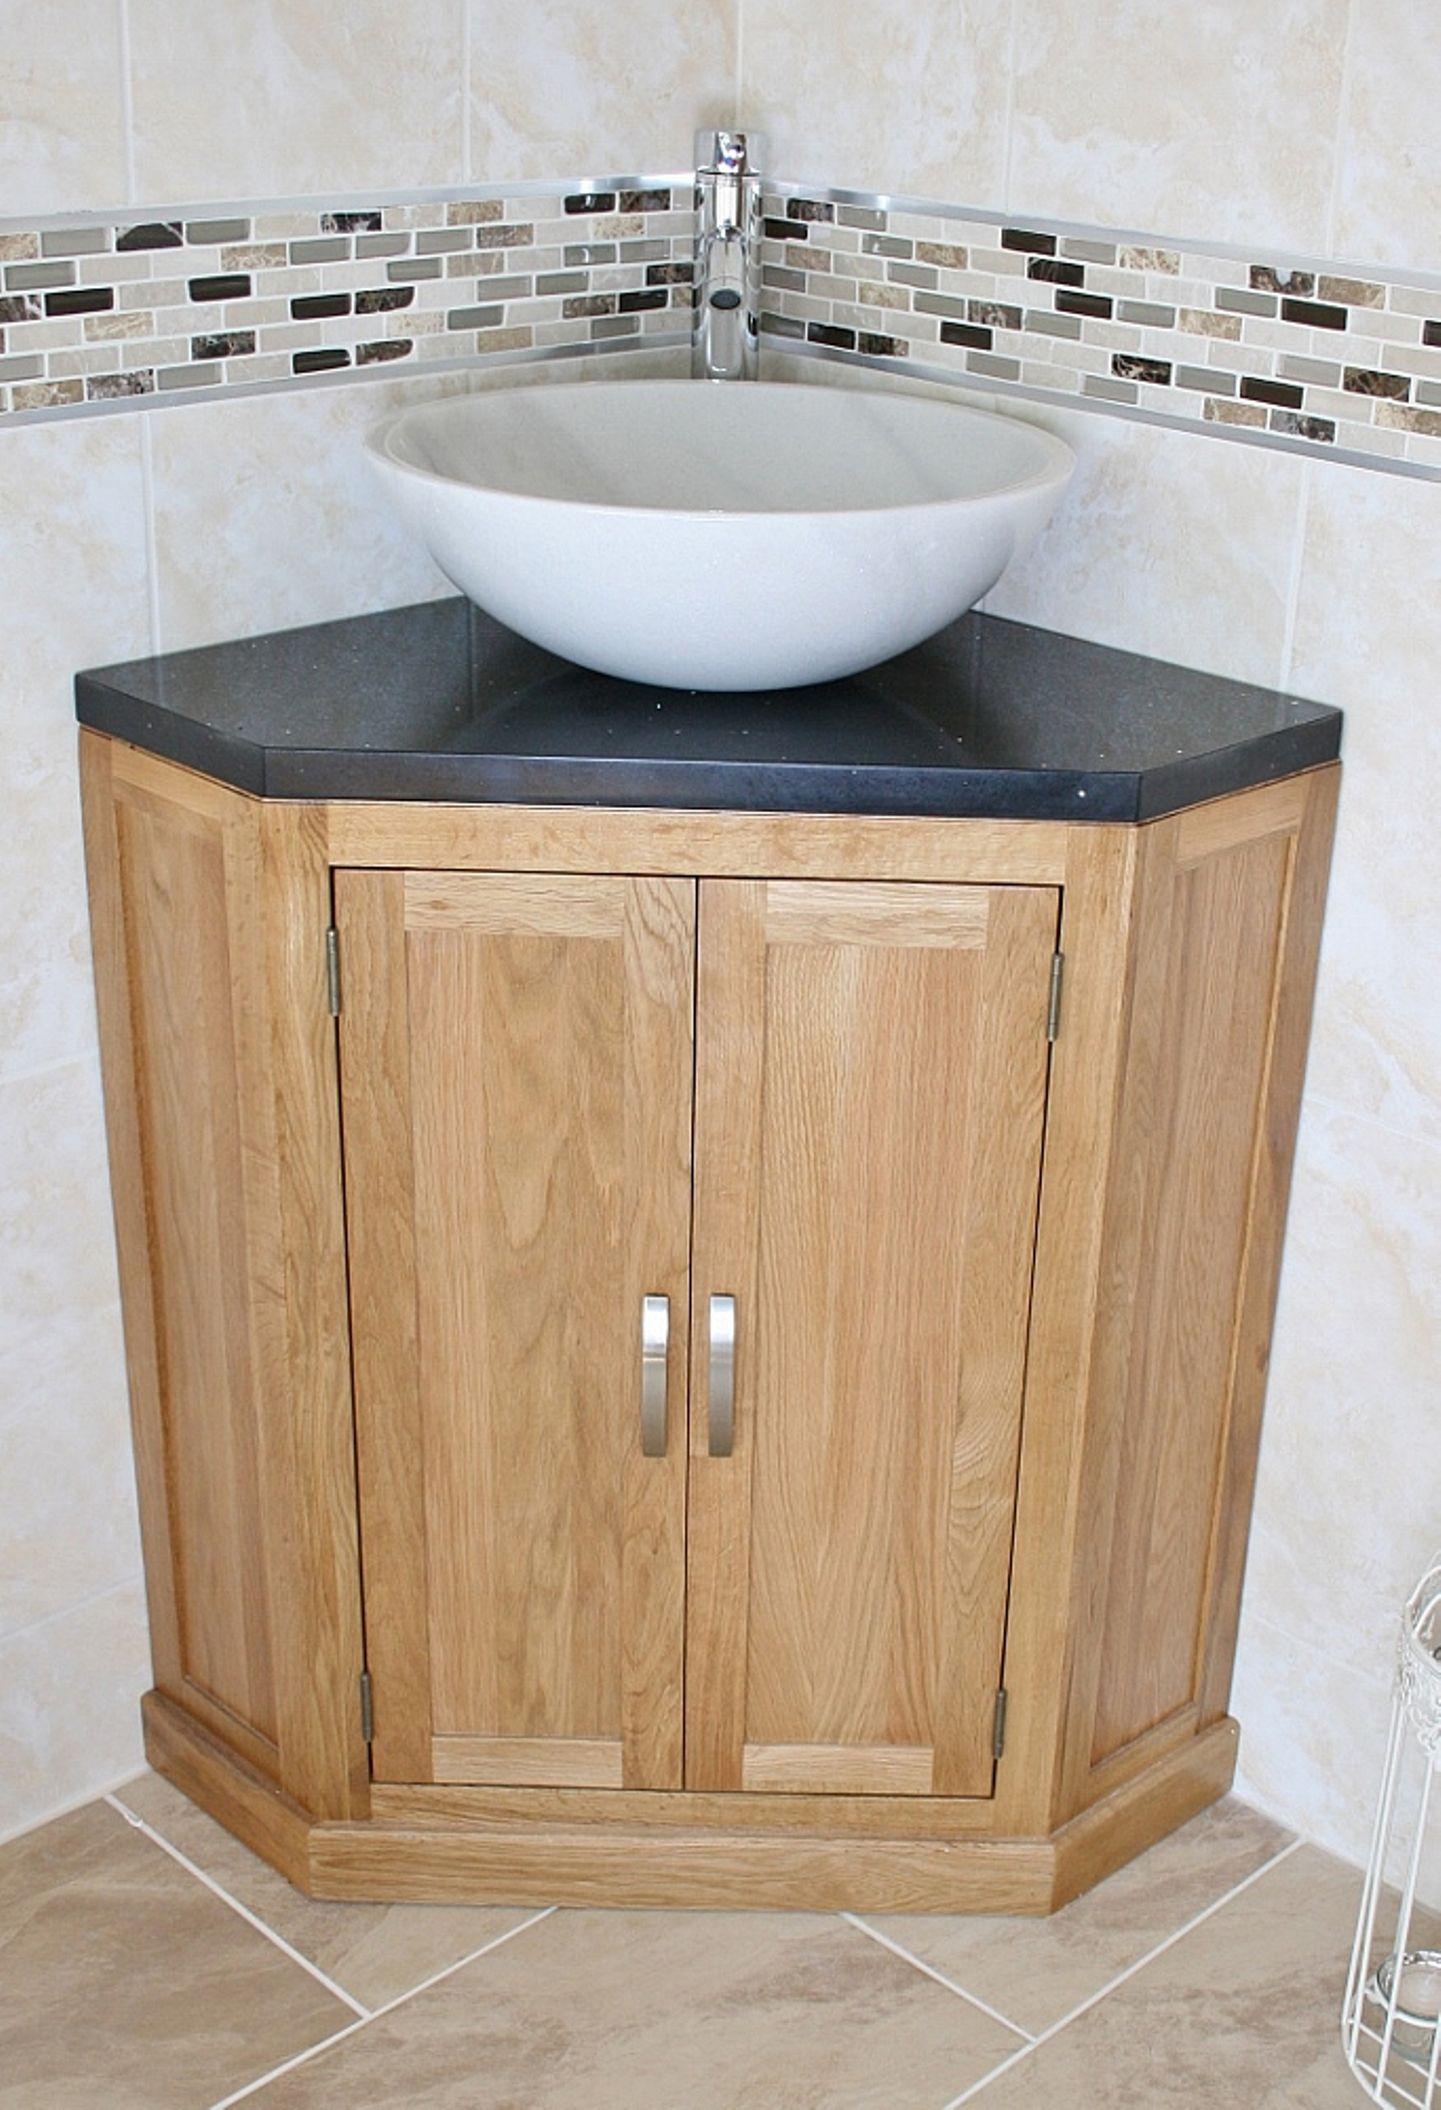 25 Incredible Vanities For Small Bathrooms With Examples Images Small Bathroom Vanities Diy Bathroom Vanity Corner Sink Bathroom